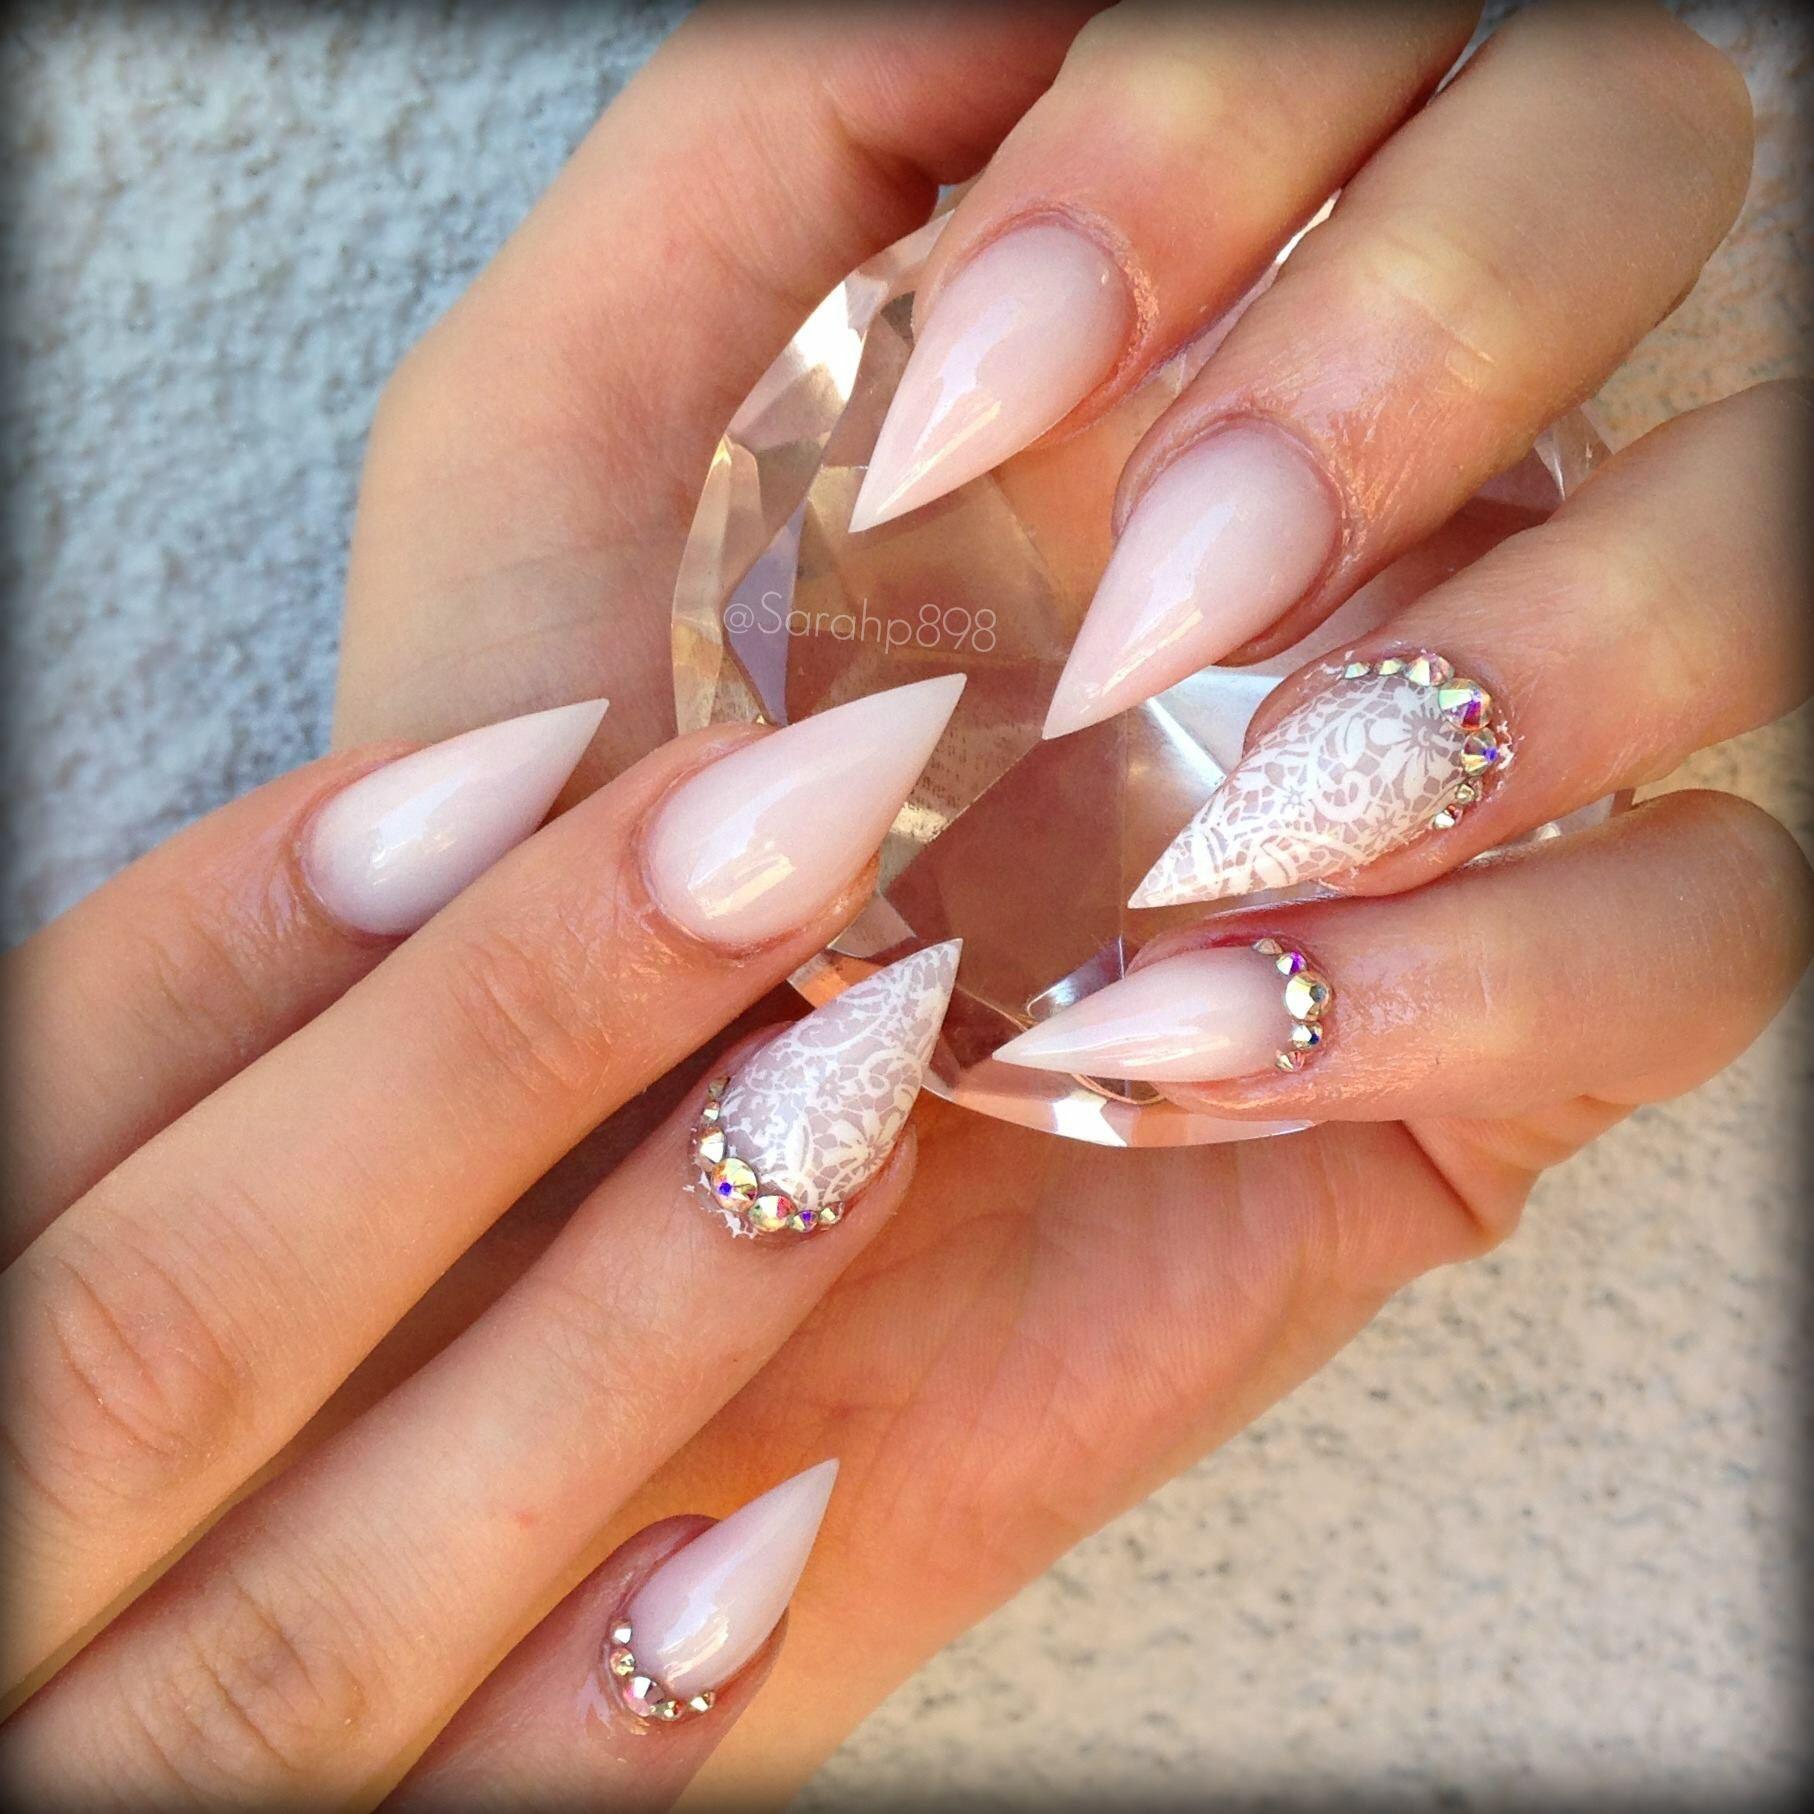 Neutral nails   Nails   Pinterest   Neutral nails, Nail inspo and ...